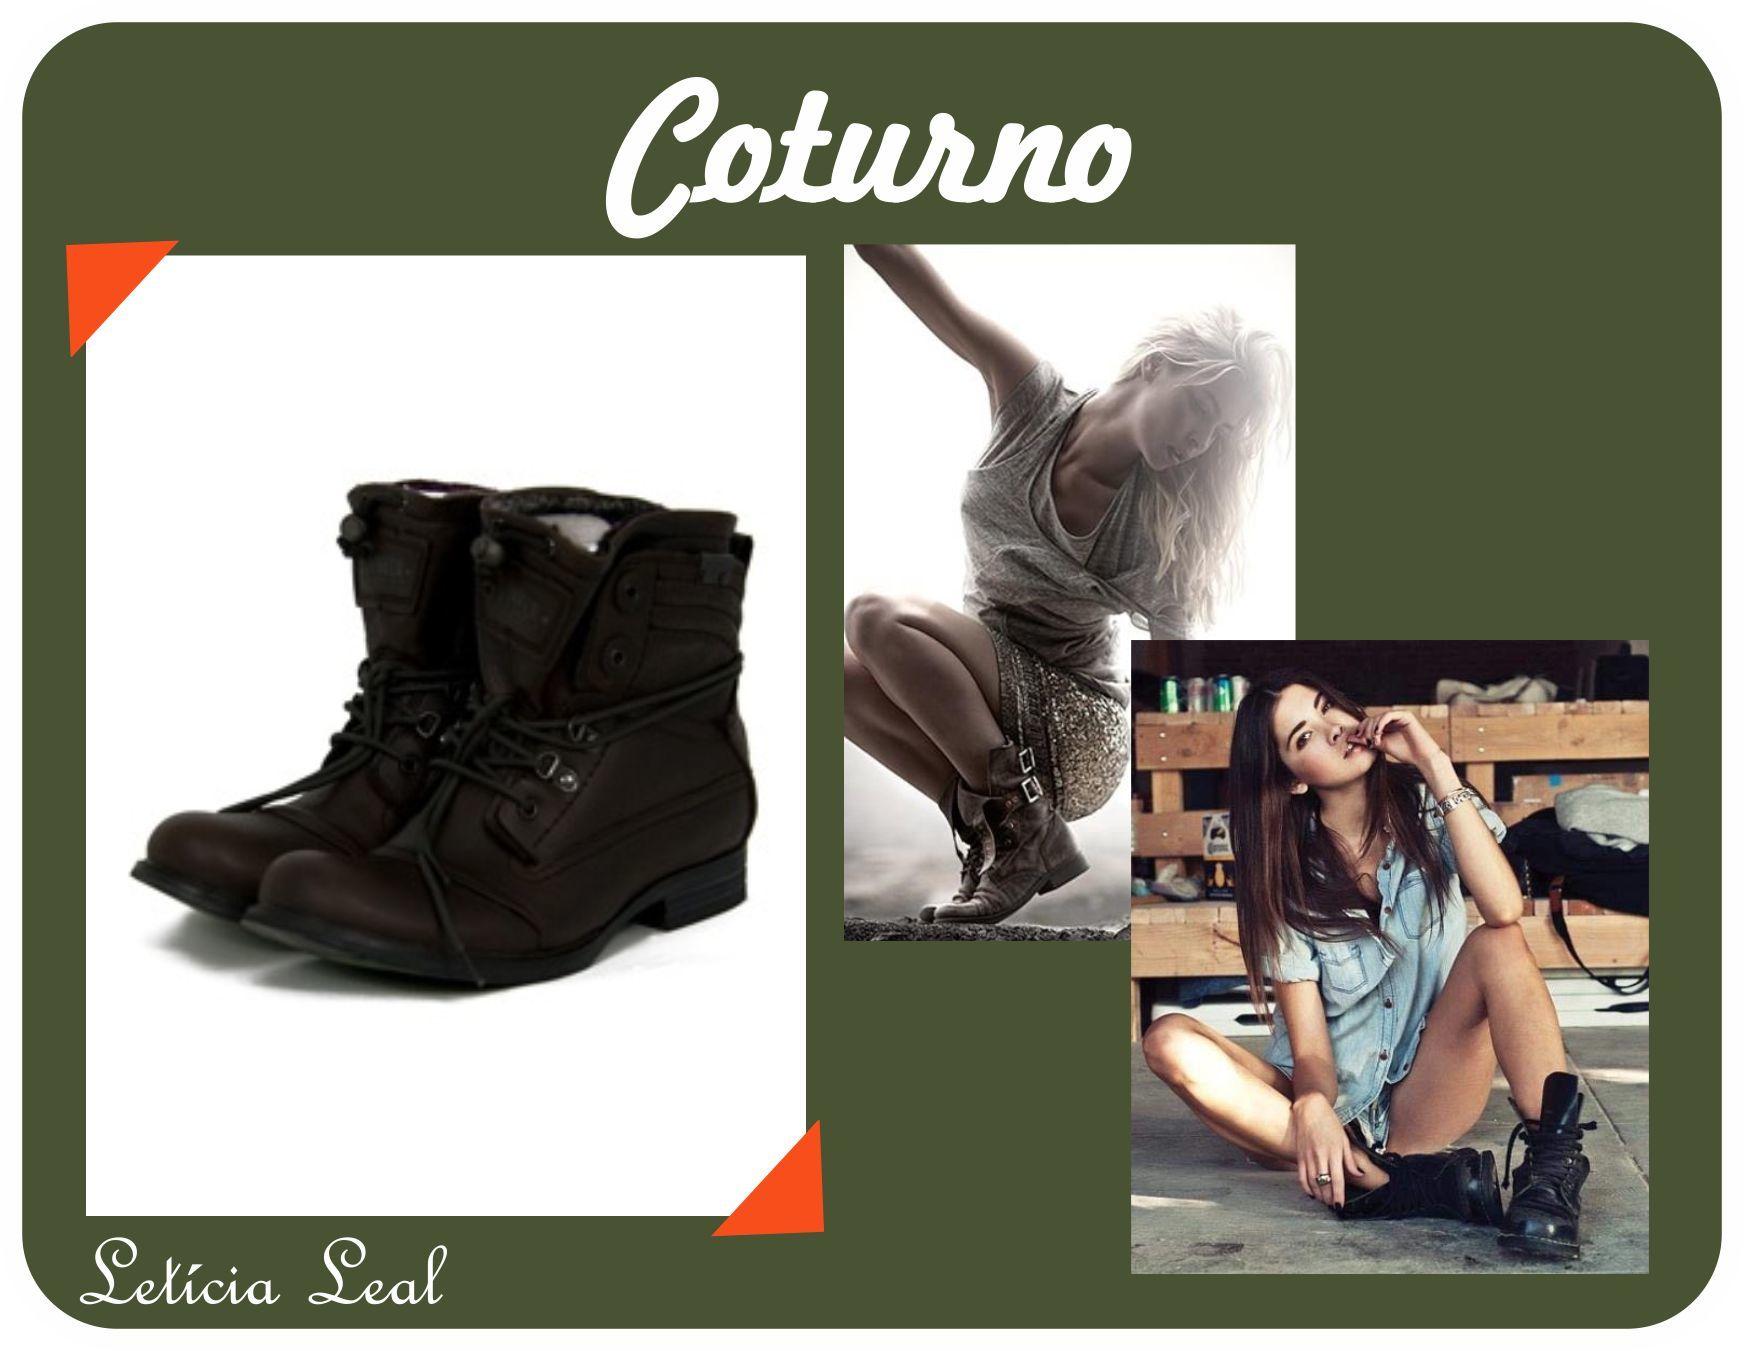 coturno_sos_solteiro